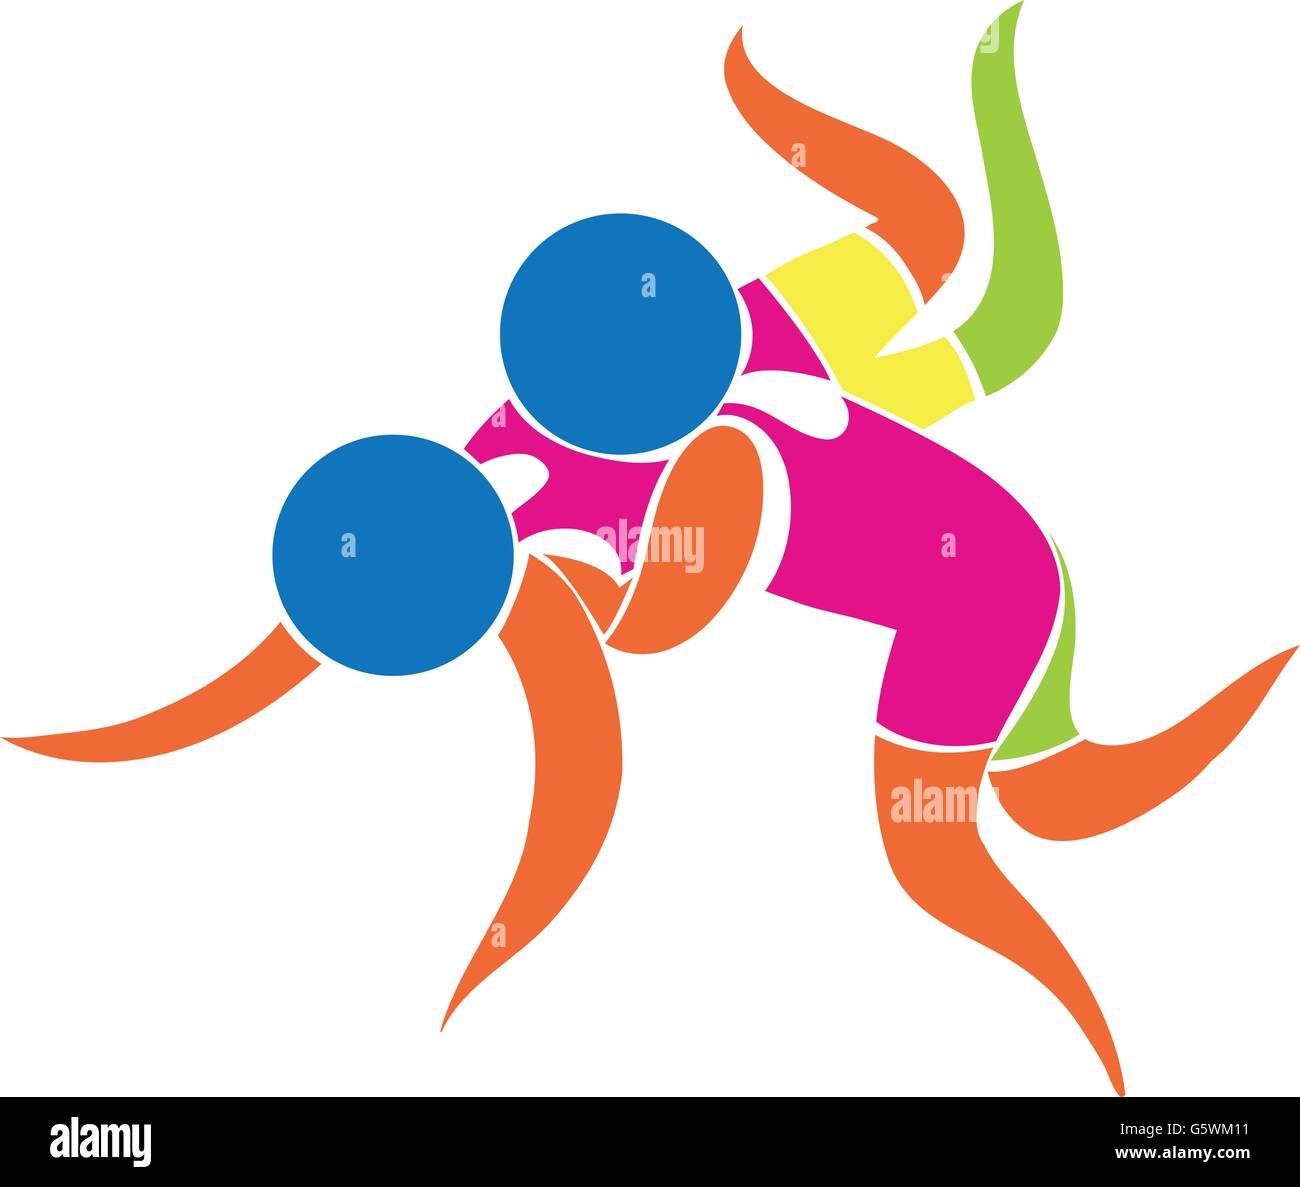 Sport icon for wrestling illustration - Stock Image